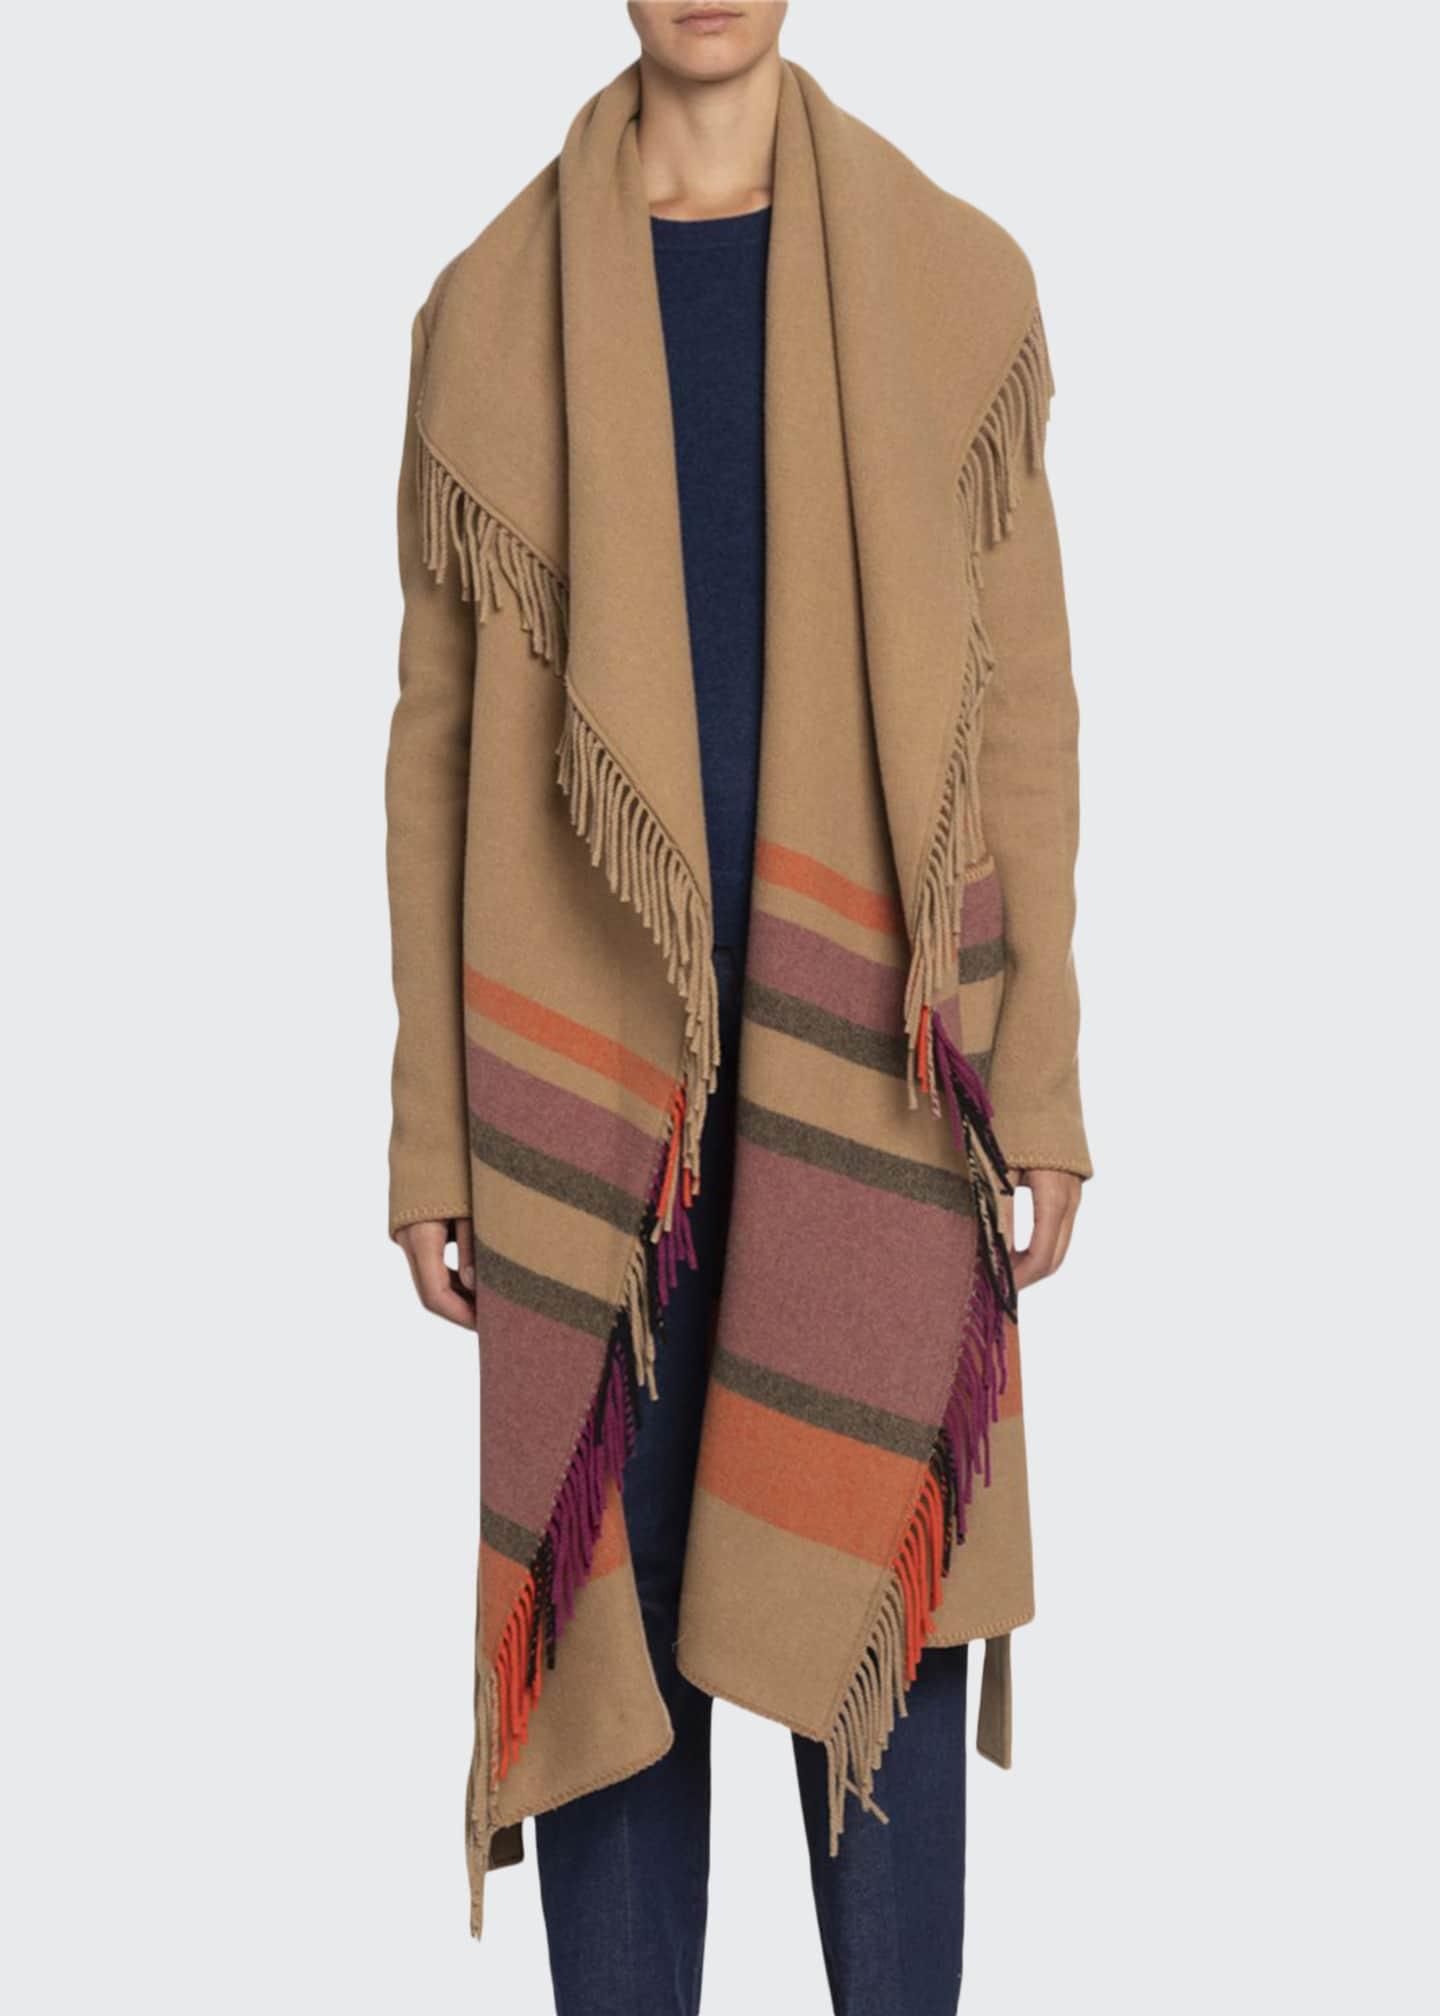 Altuzarra Striped Fringed-Wool Shawl